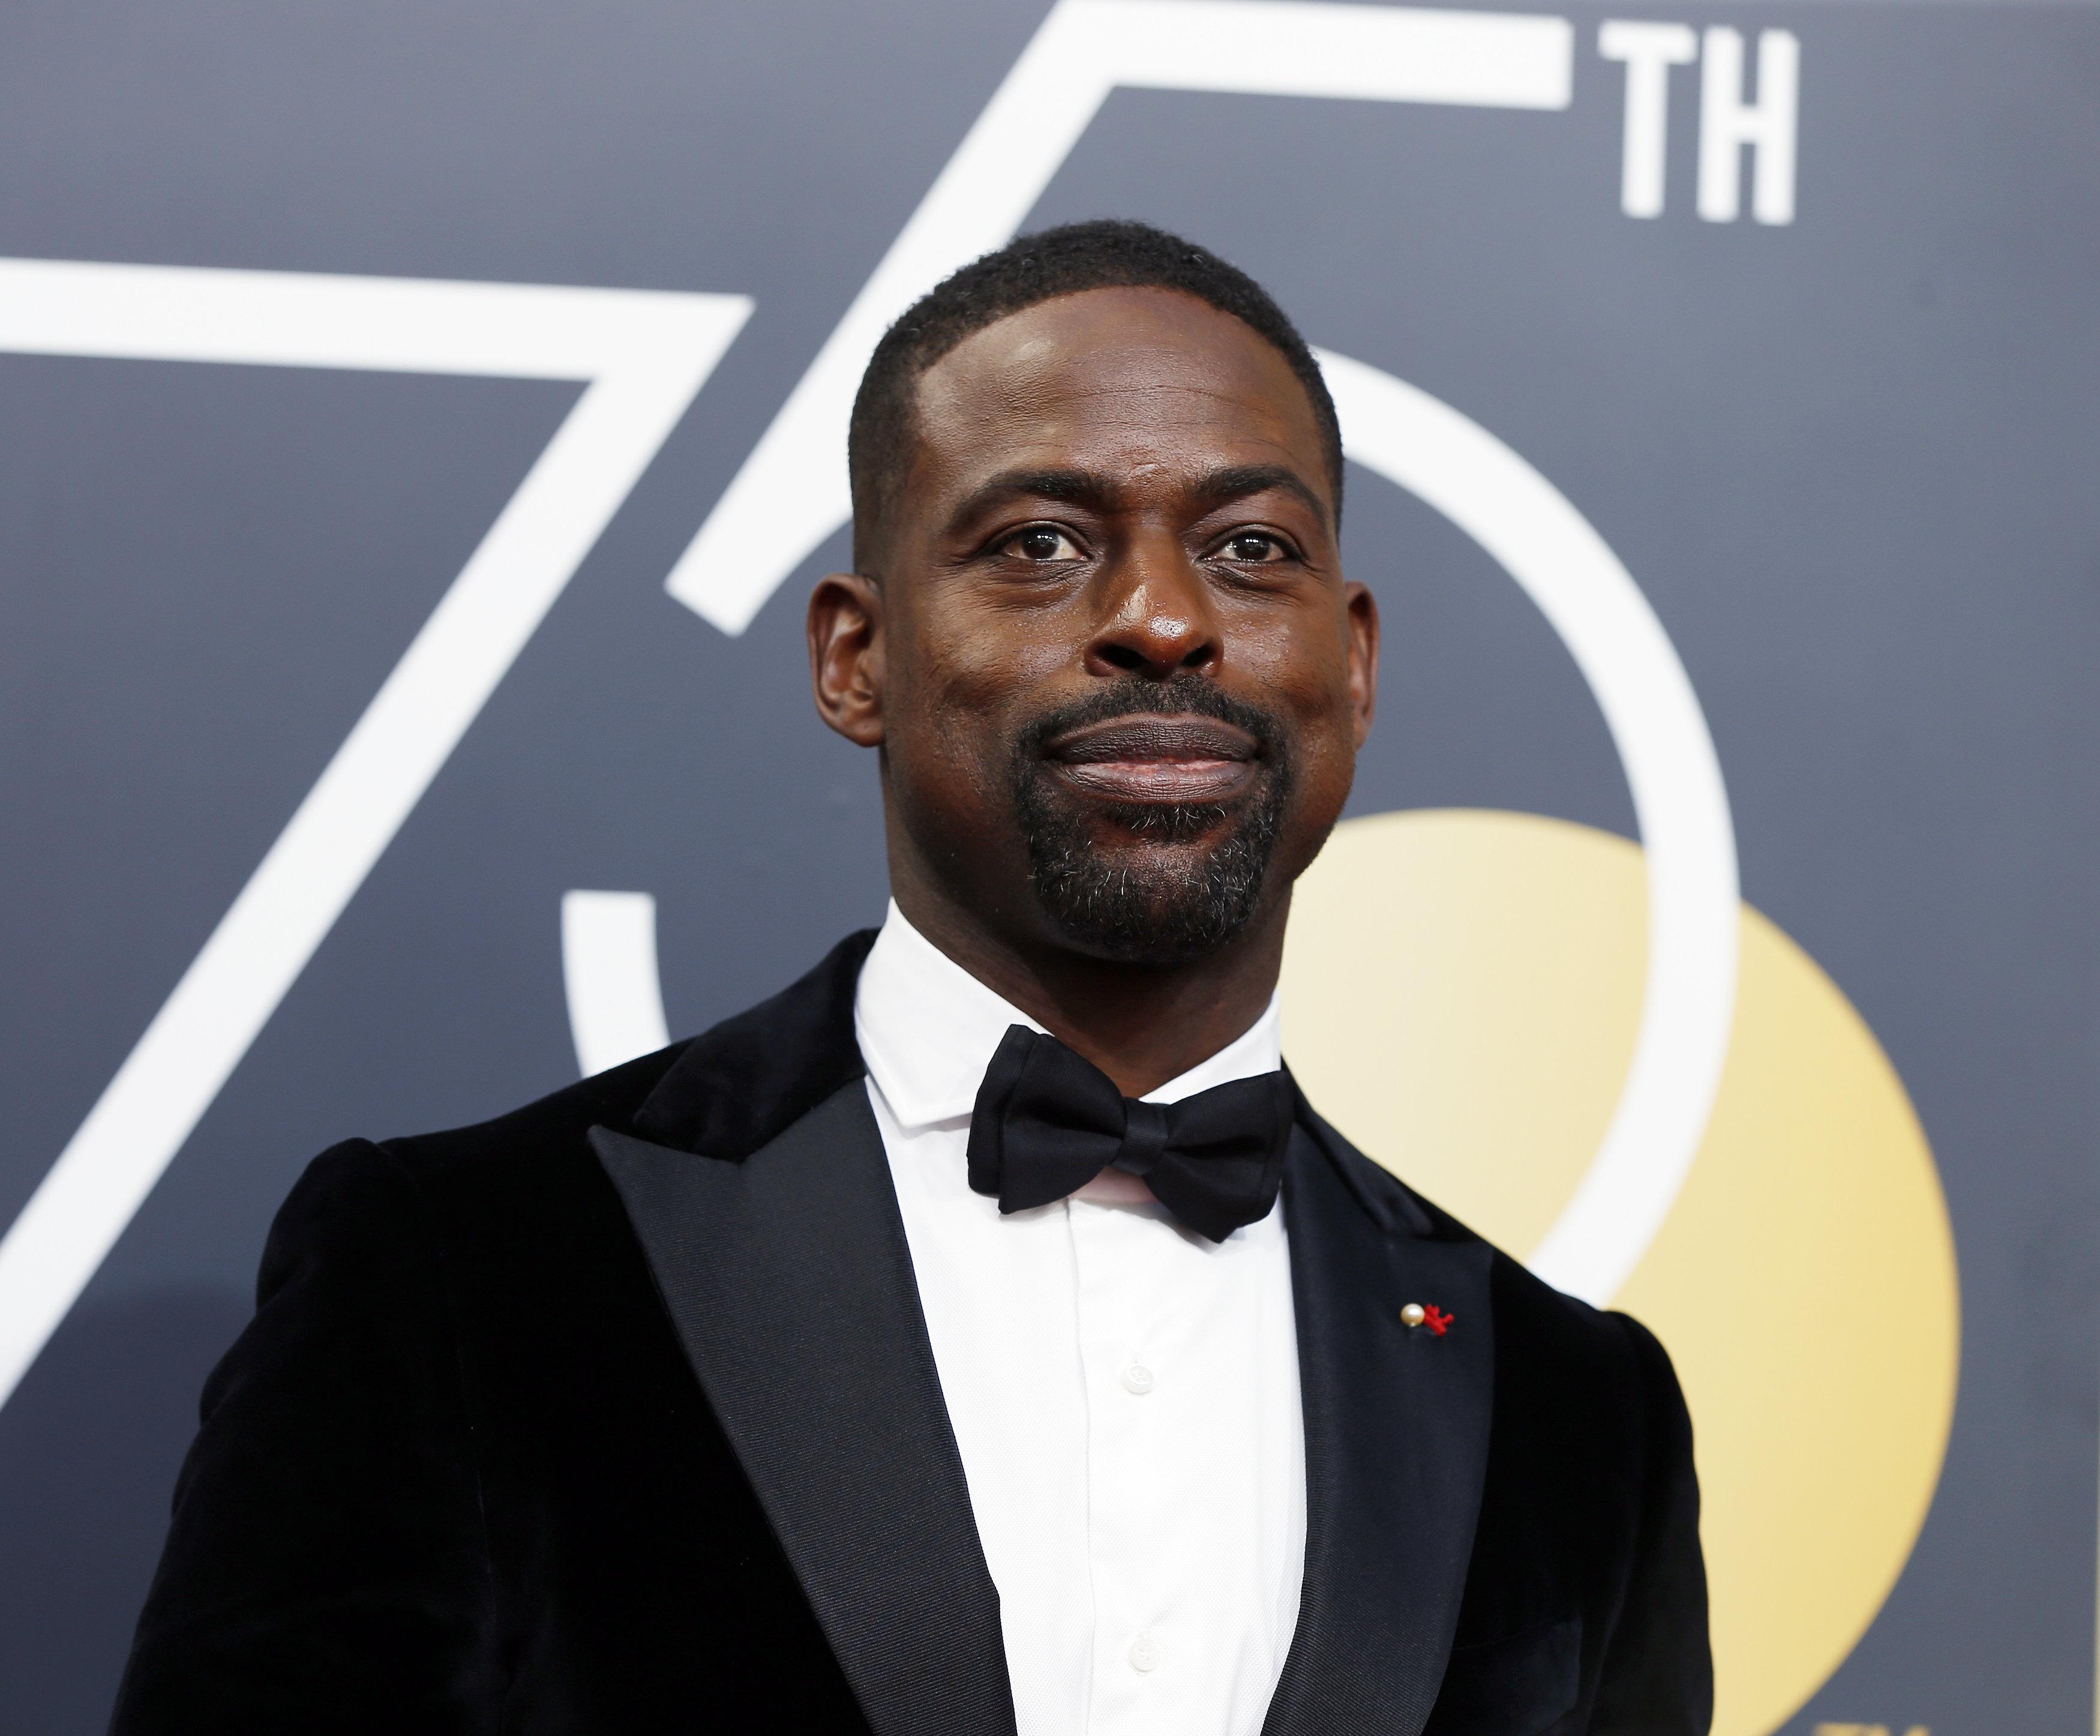 75thGolden Globe Awards – Arrivals – Beverly Hills, California, U.S.,07/01/2018– Sterling K. Brown. REUTERS/Mario Anzuoni